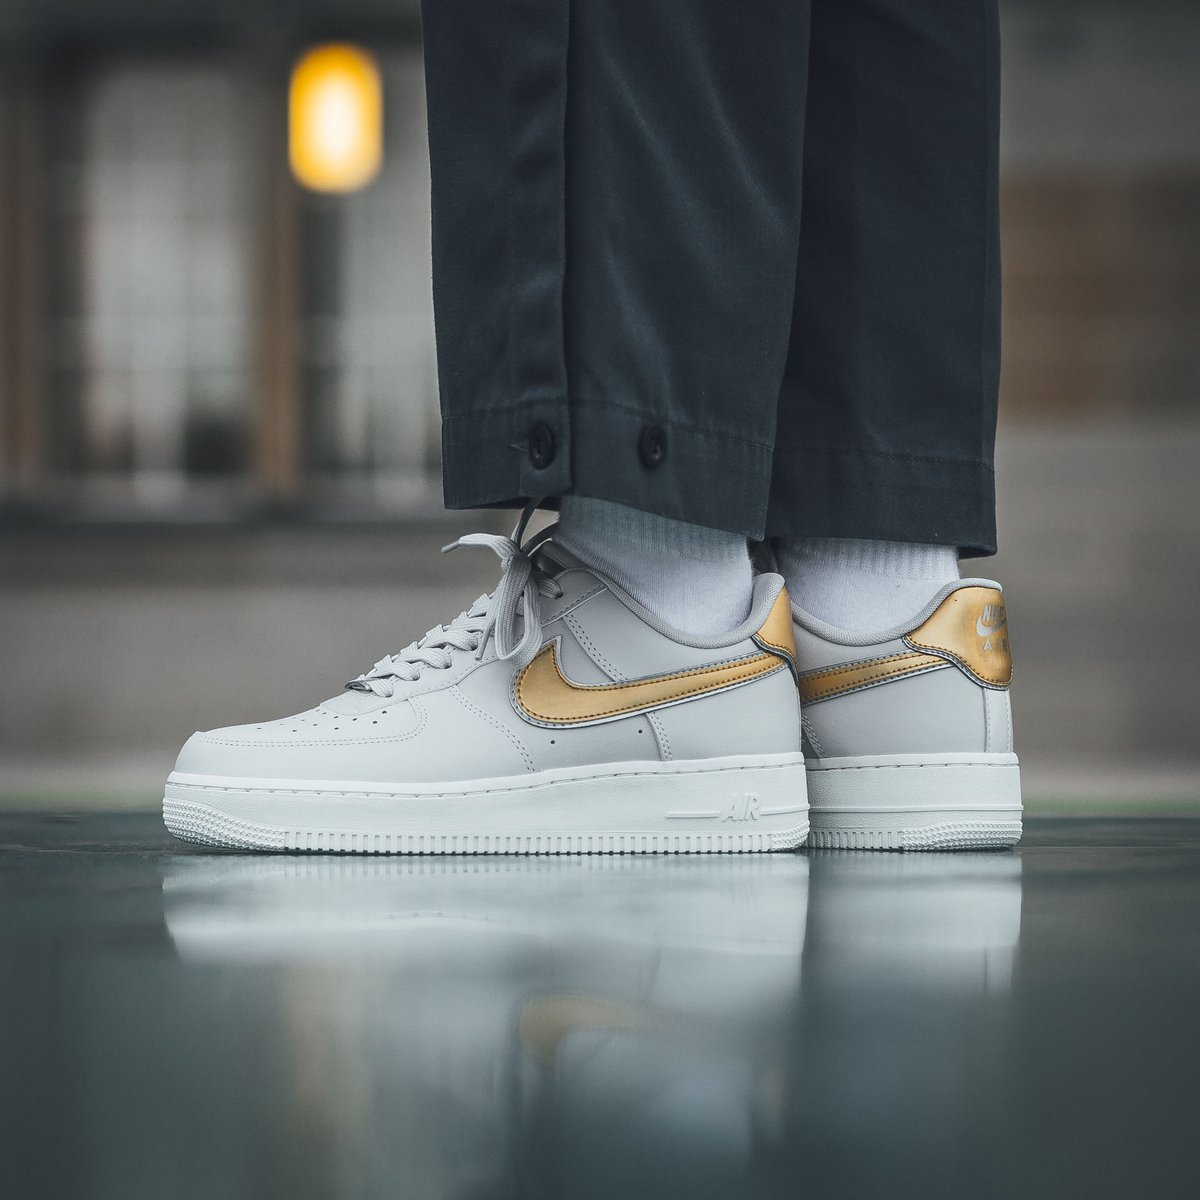 cheap for discount 98977 e7da3 NOW on  sale ✨ Nike Wmns Air Force 1  07 Metallic - Vast Grey